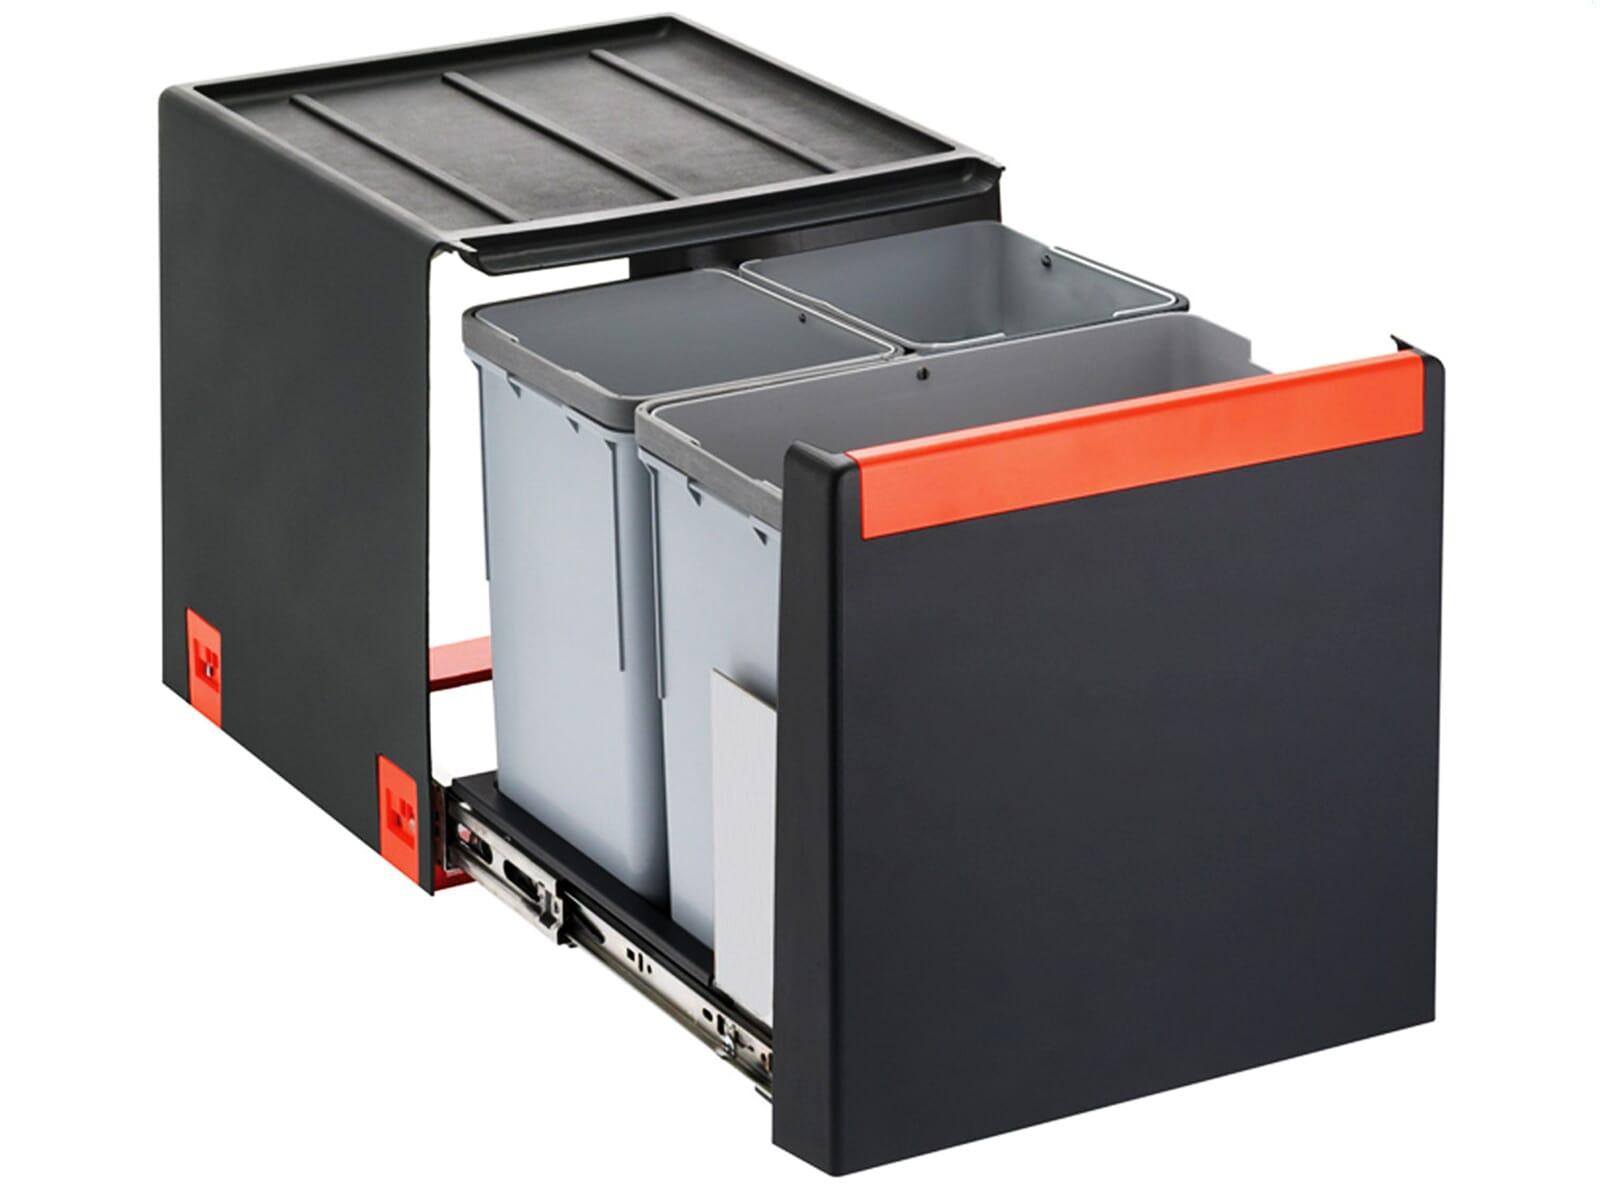 Produktabbildung Franke Sorter Cube 40 - 134.0039.329 Einbau Abfallsammler